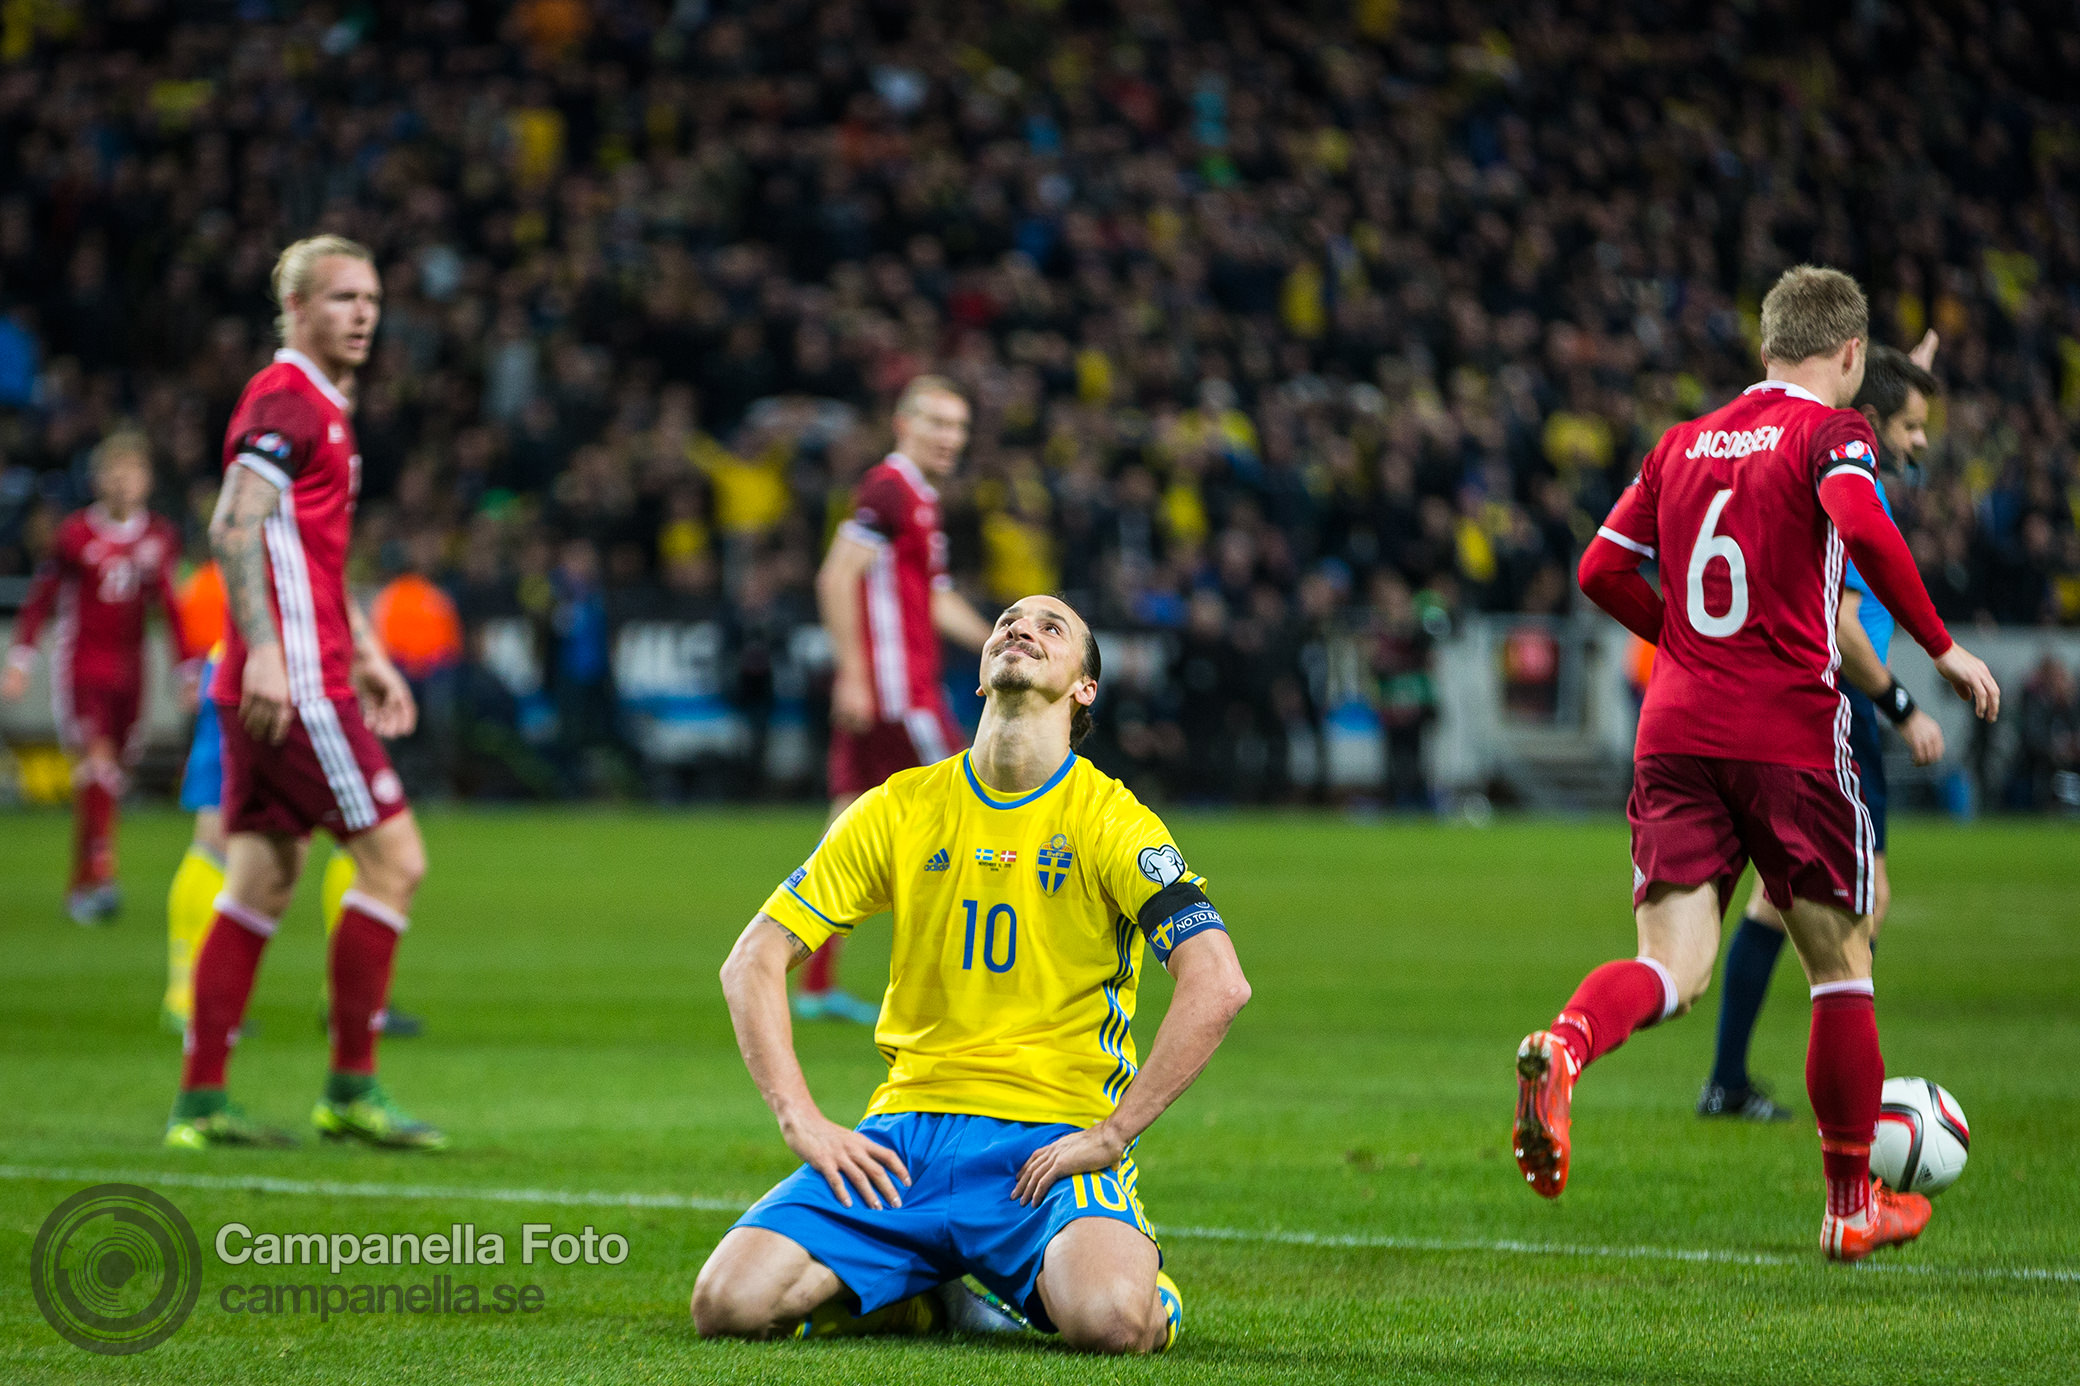 Nordic Derby - Michael Campanella Photography